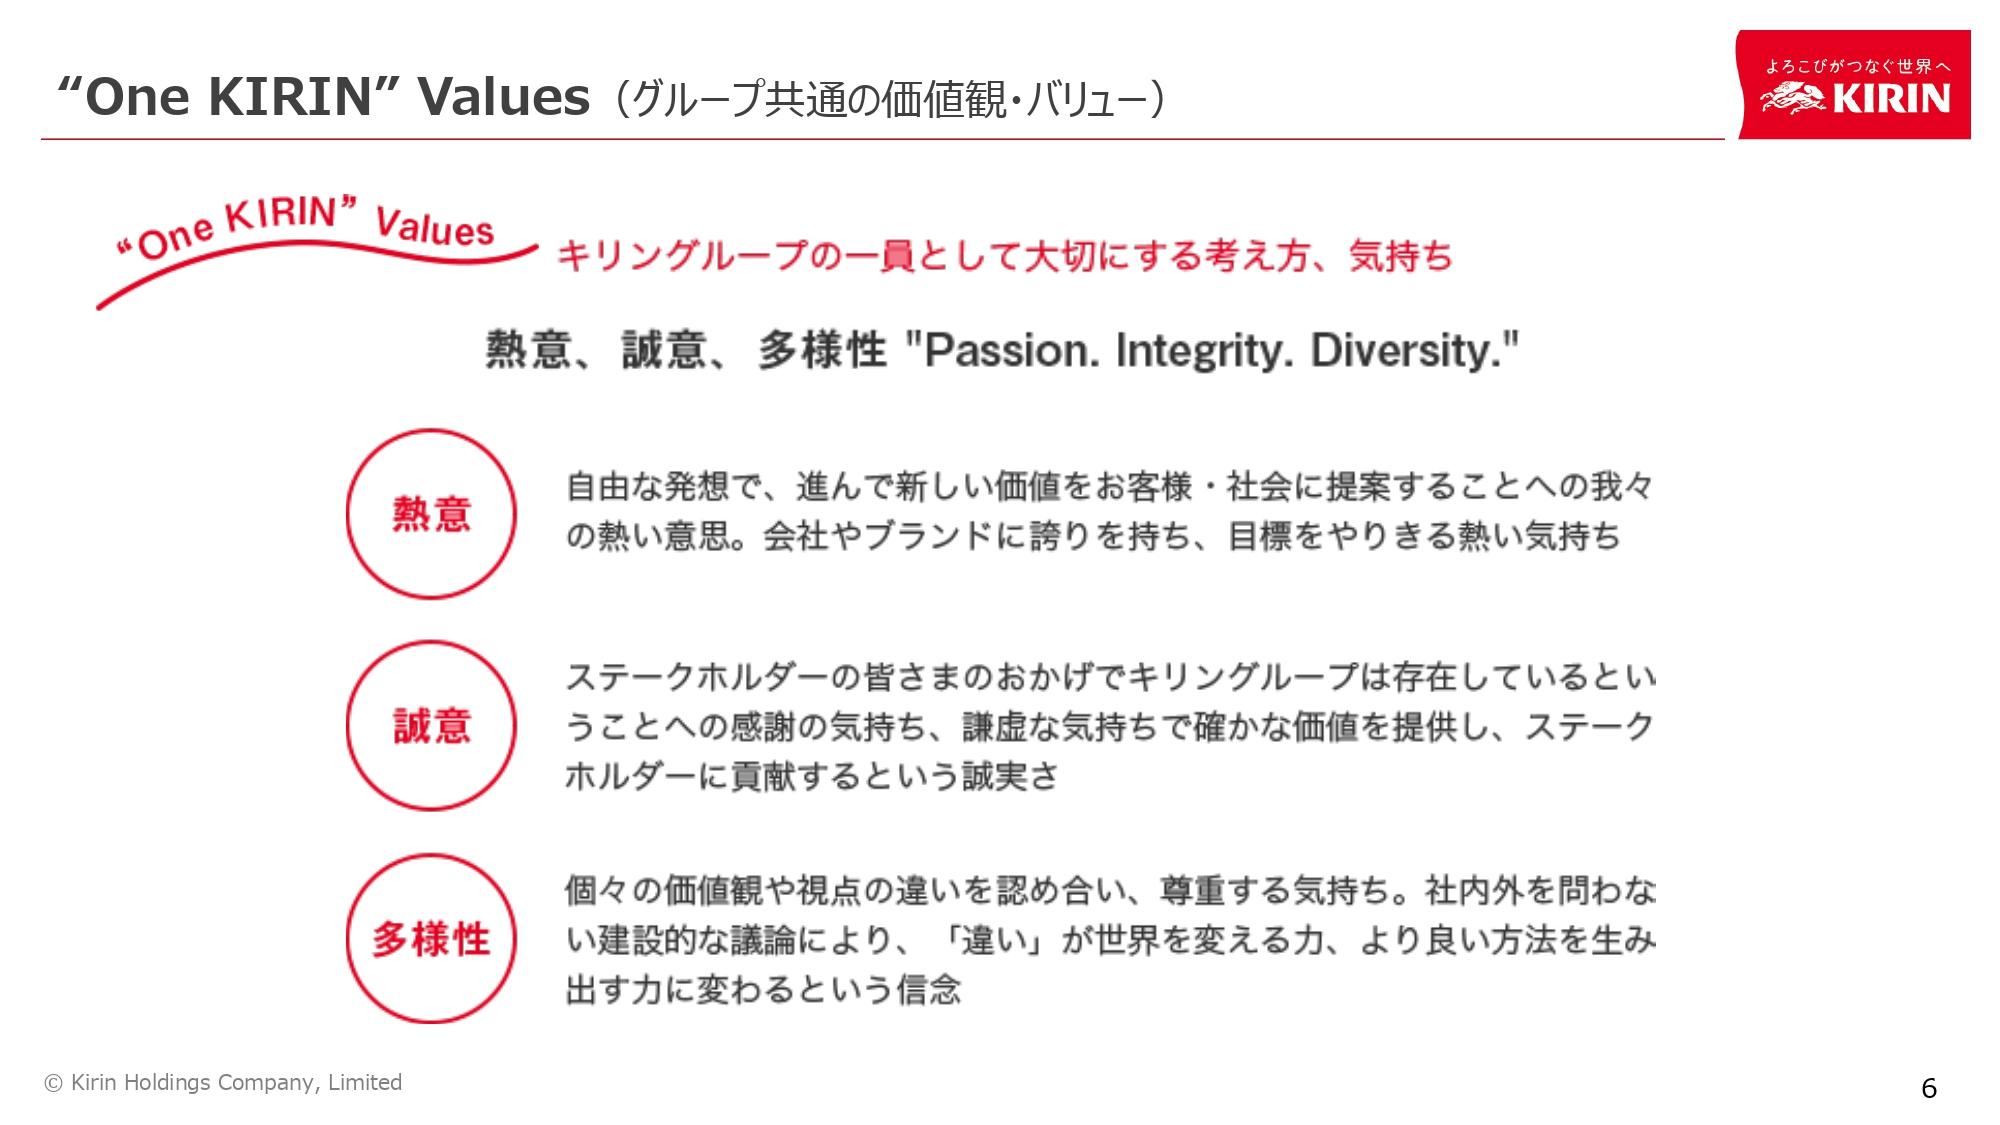 One KIRIN Values